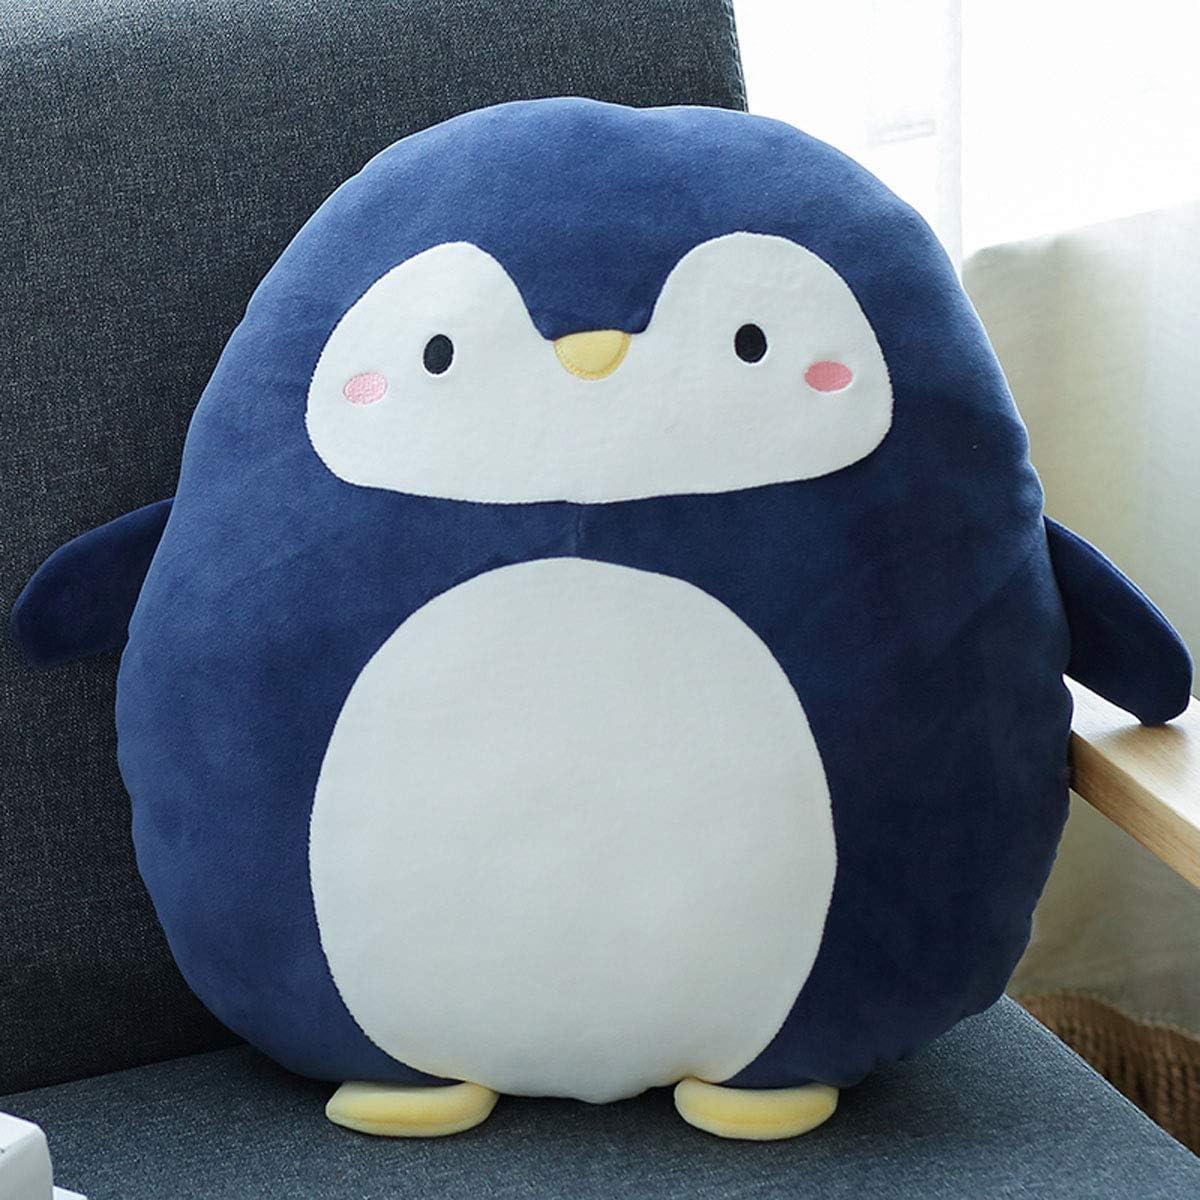 Ruzucoda Plush Penguin Hugging Pillows Ocean Stuffed Animals Toys Cute Decorative Pillow Sofa Decorations Soft Cushion Navy 15.7 Inches